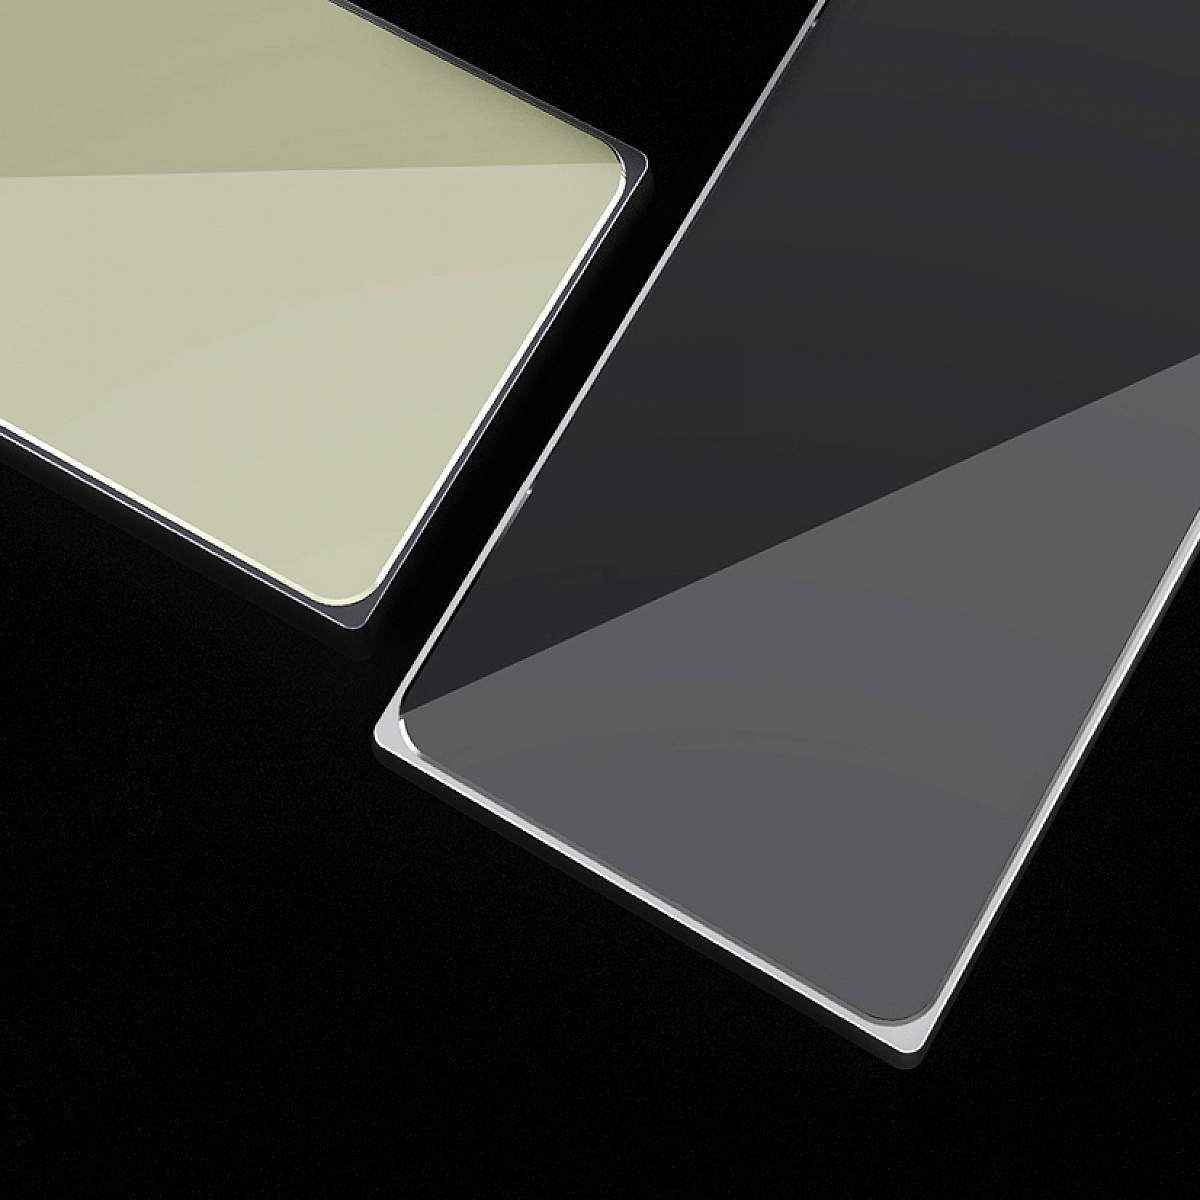 Buy Zinc Alloy Mirror Power Bank 5v 20a Wk Model Wp 005 Online Design Powerbank 10000 Mah